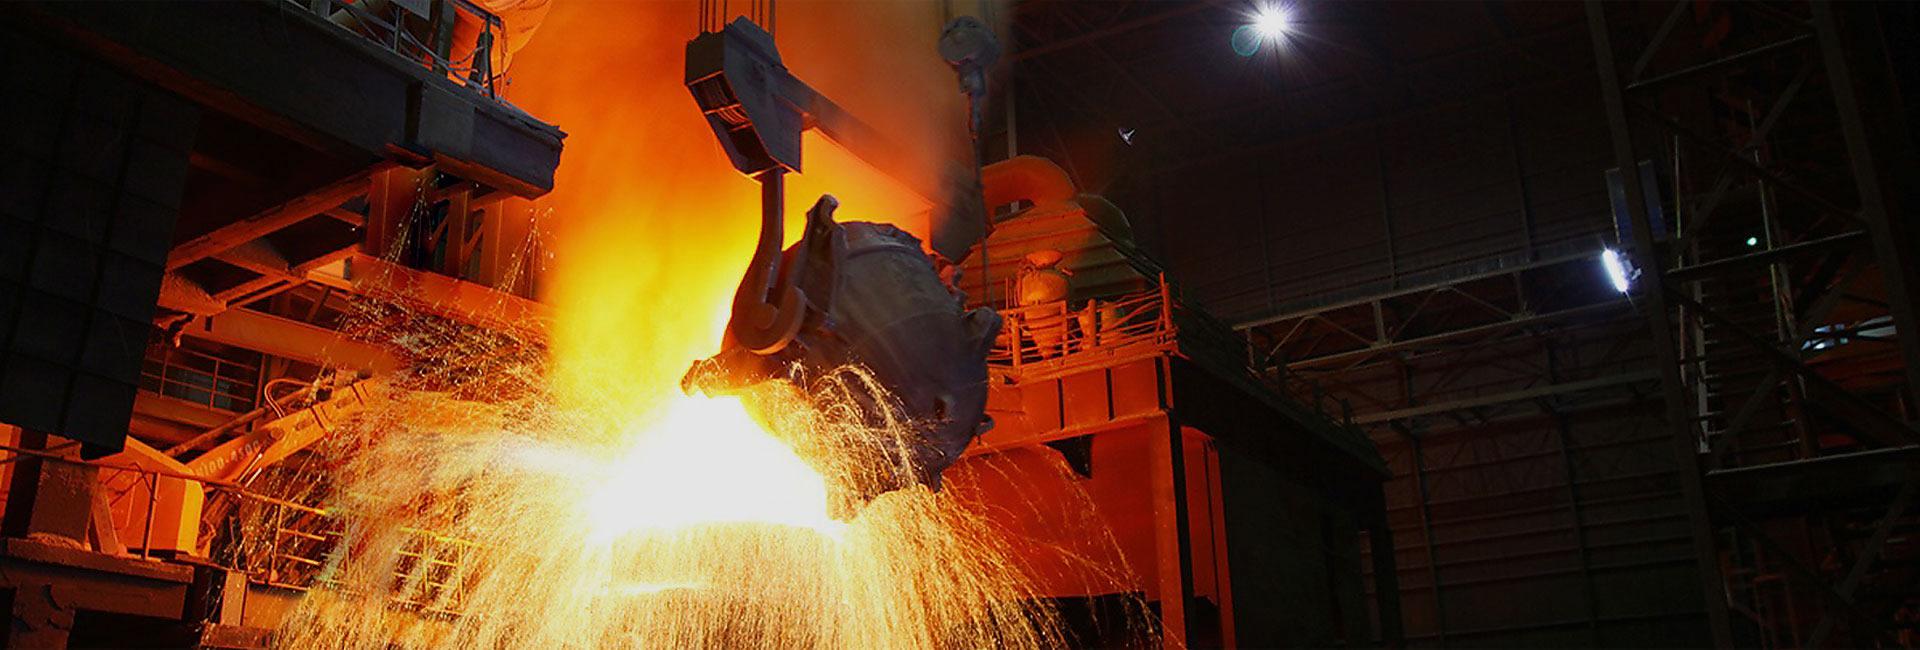 Metallurgical steel rolling